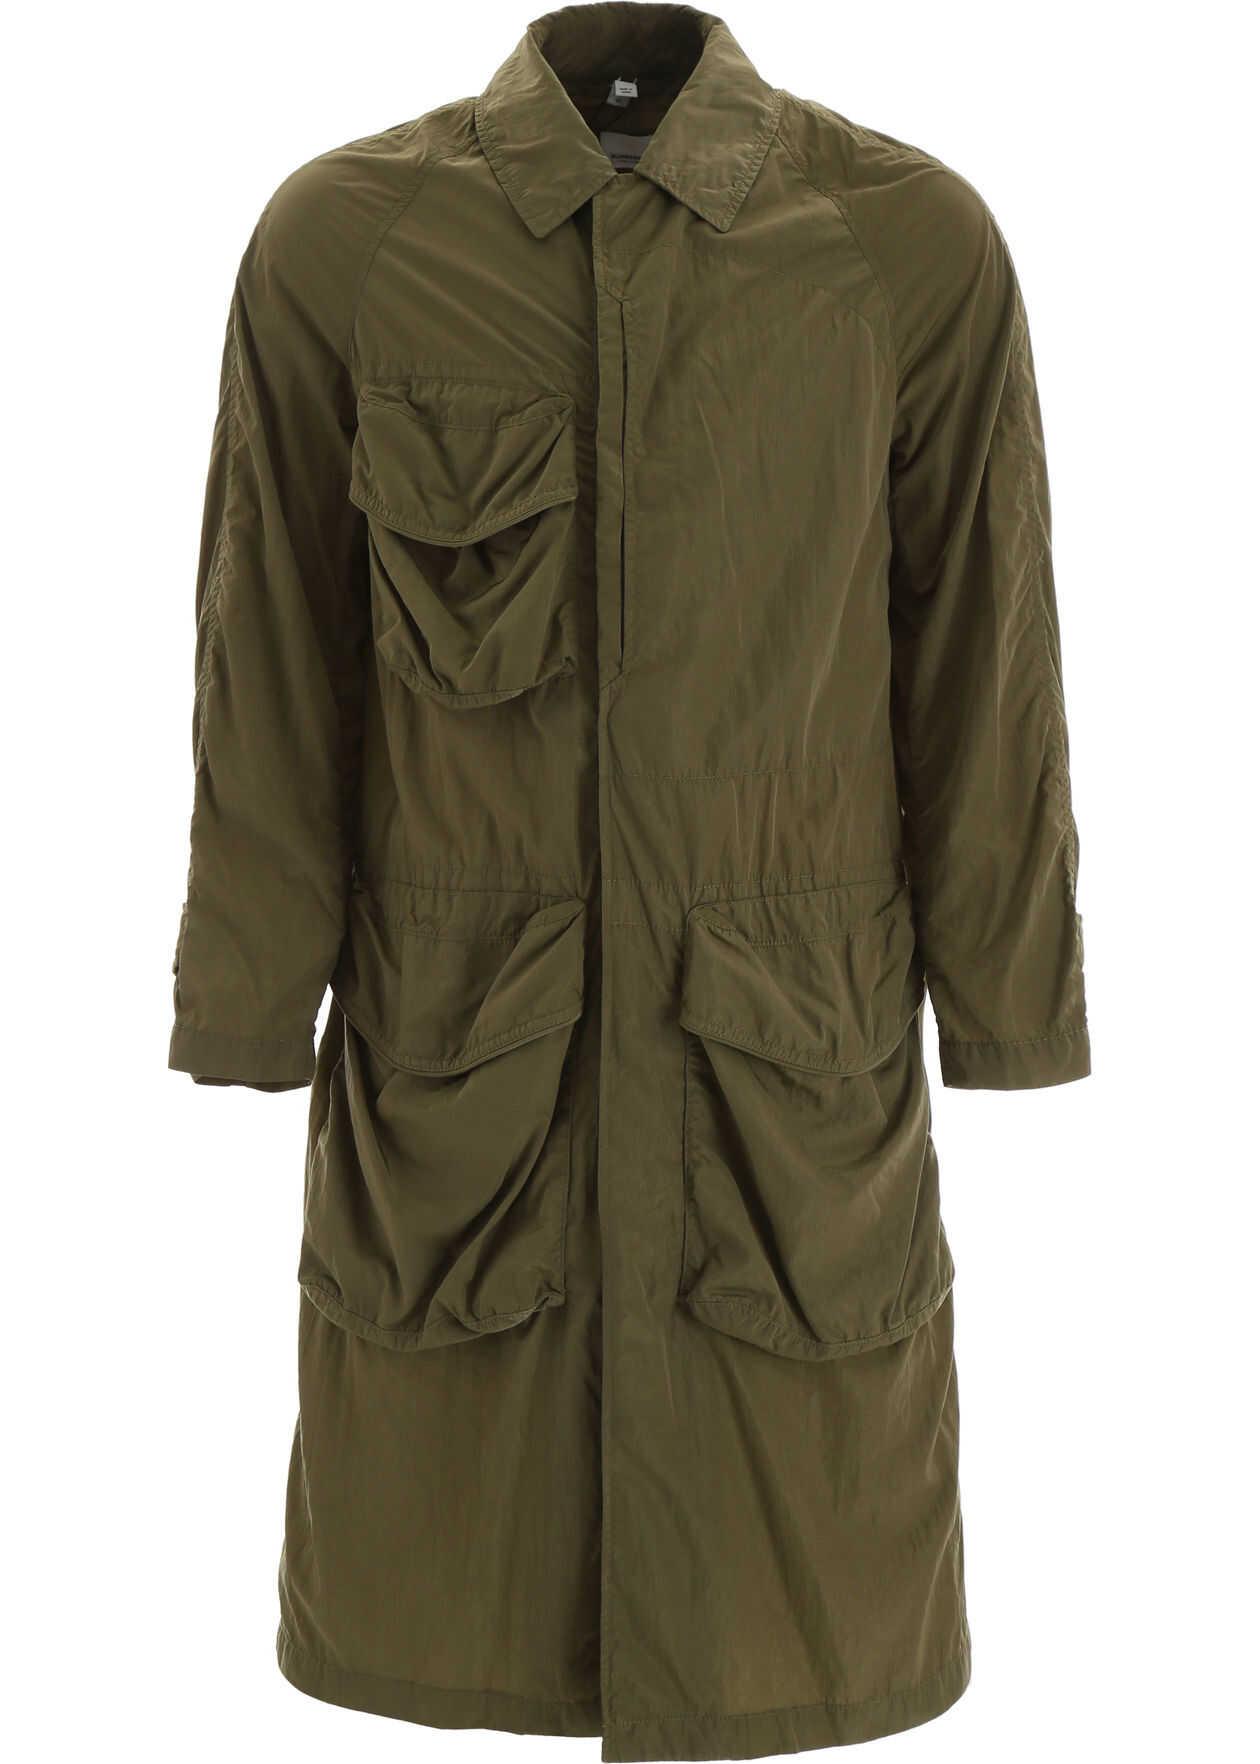 Burberry Raincoat With Cargo Pockets LIGHT MOSS